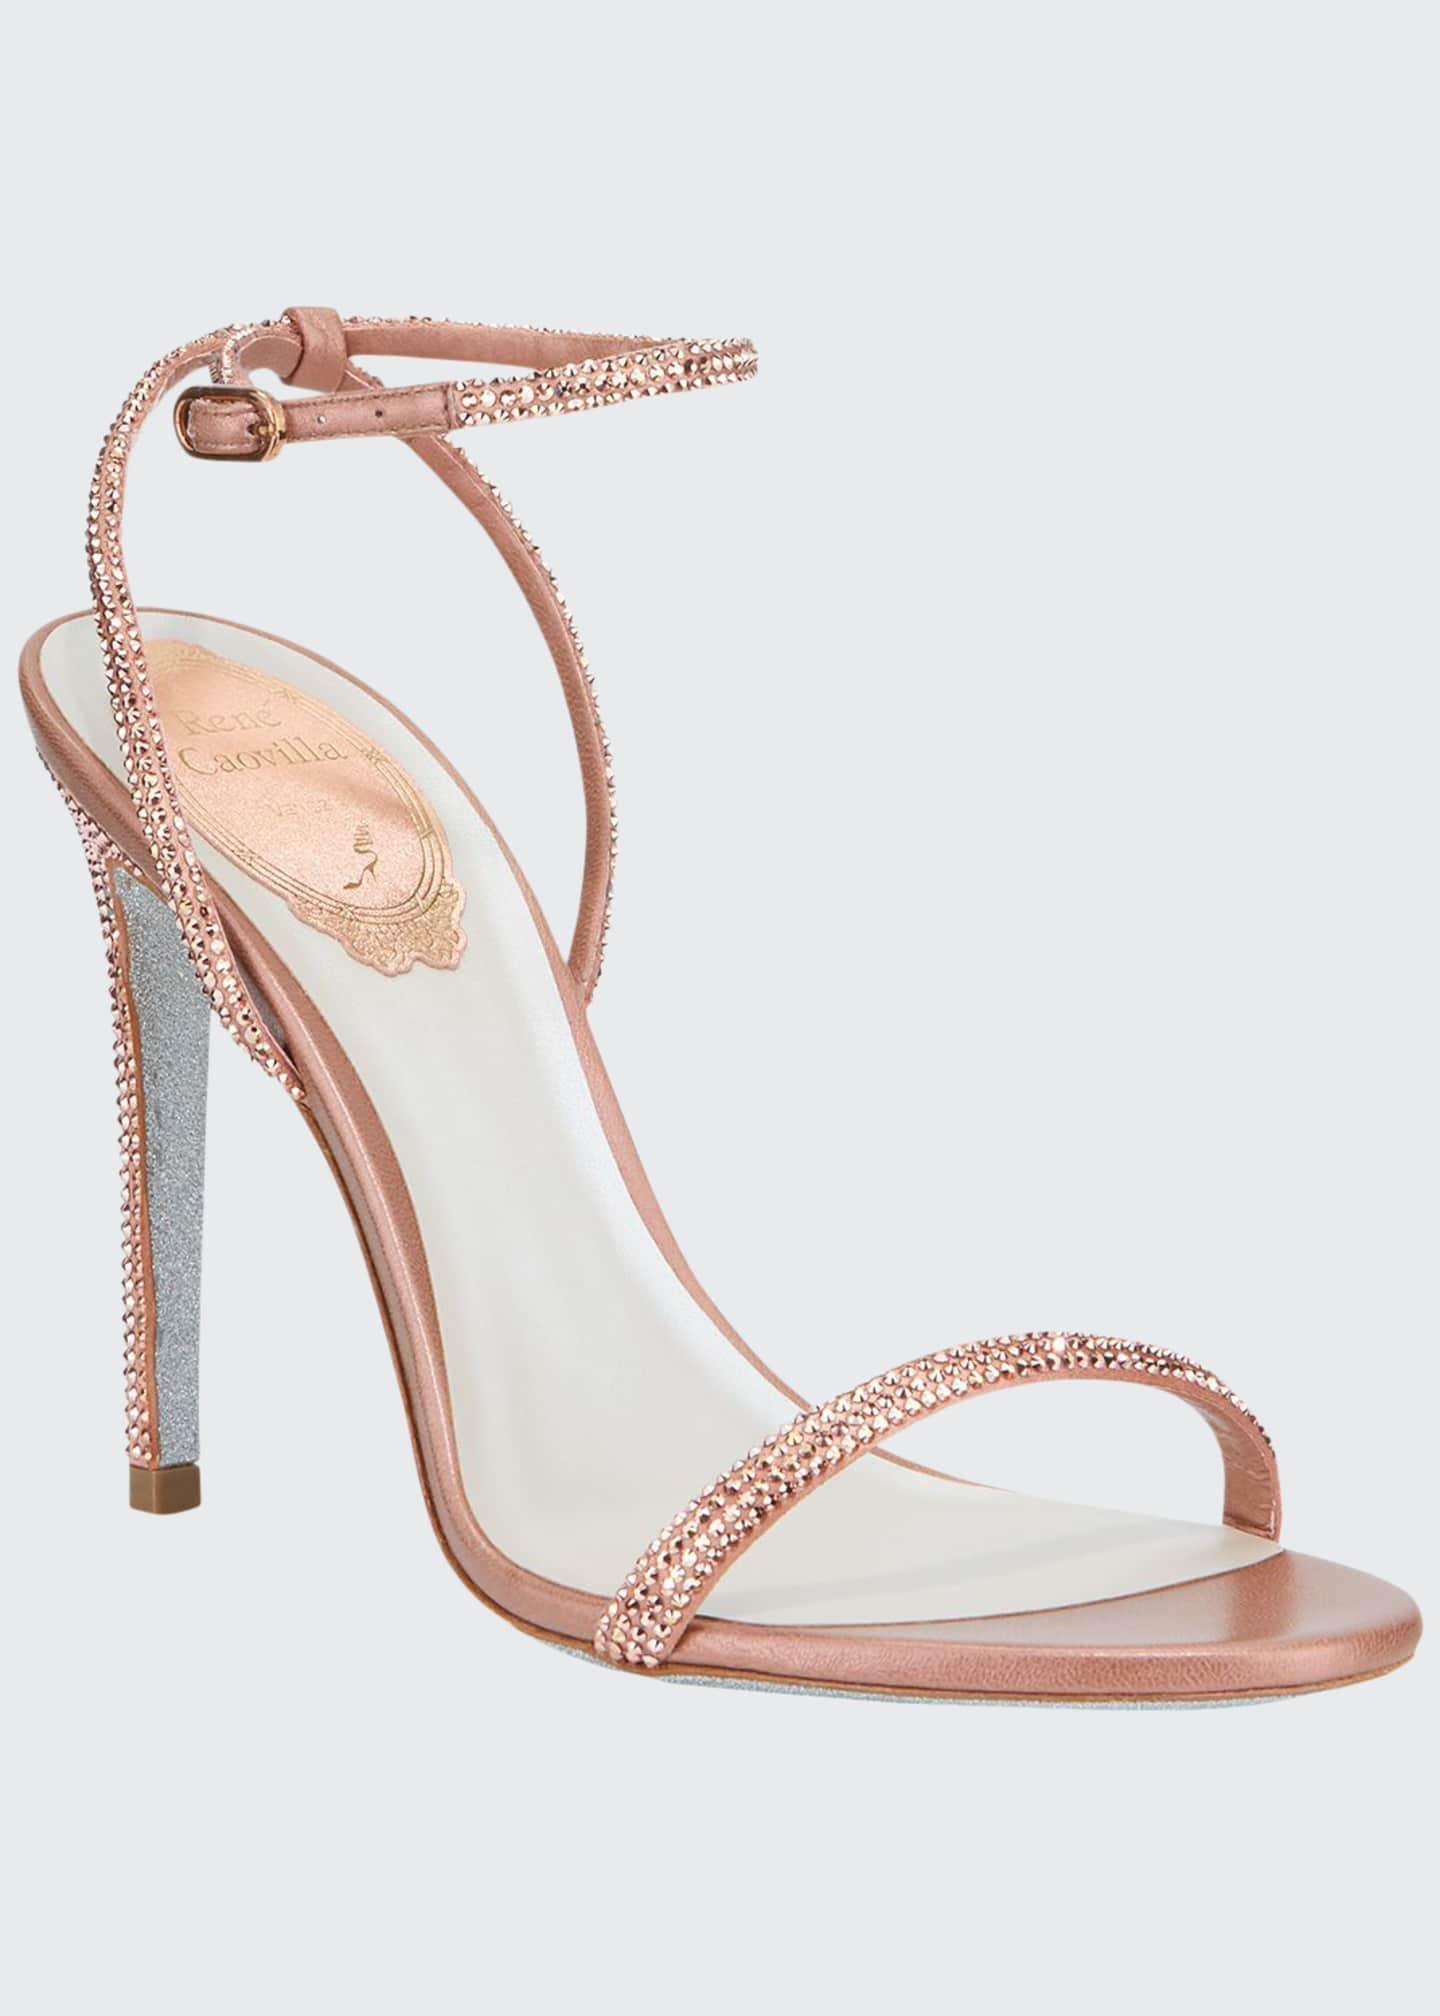 Rene Caovilla Ellabrita Crystal Satin Ankle-Strap Sandals